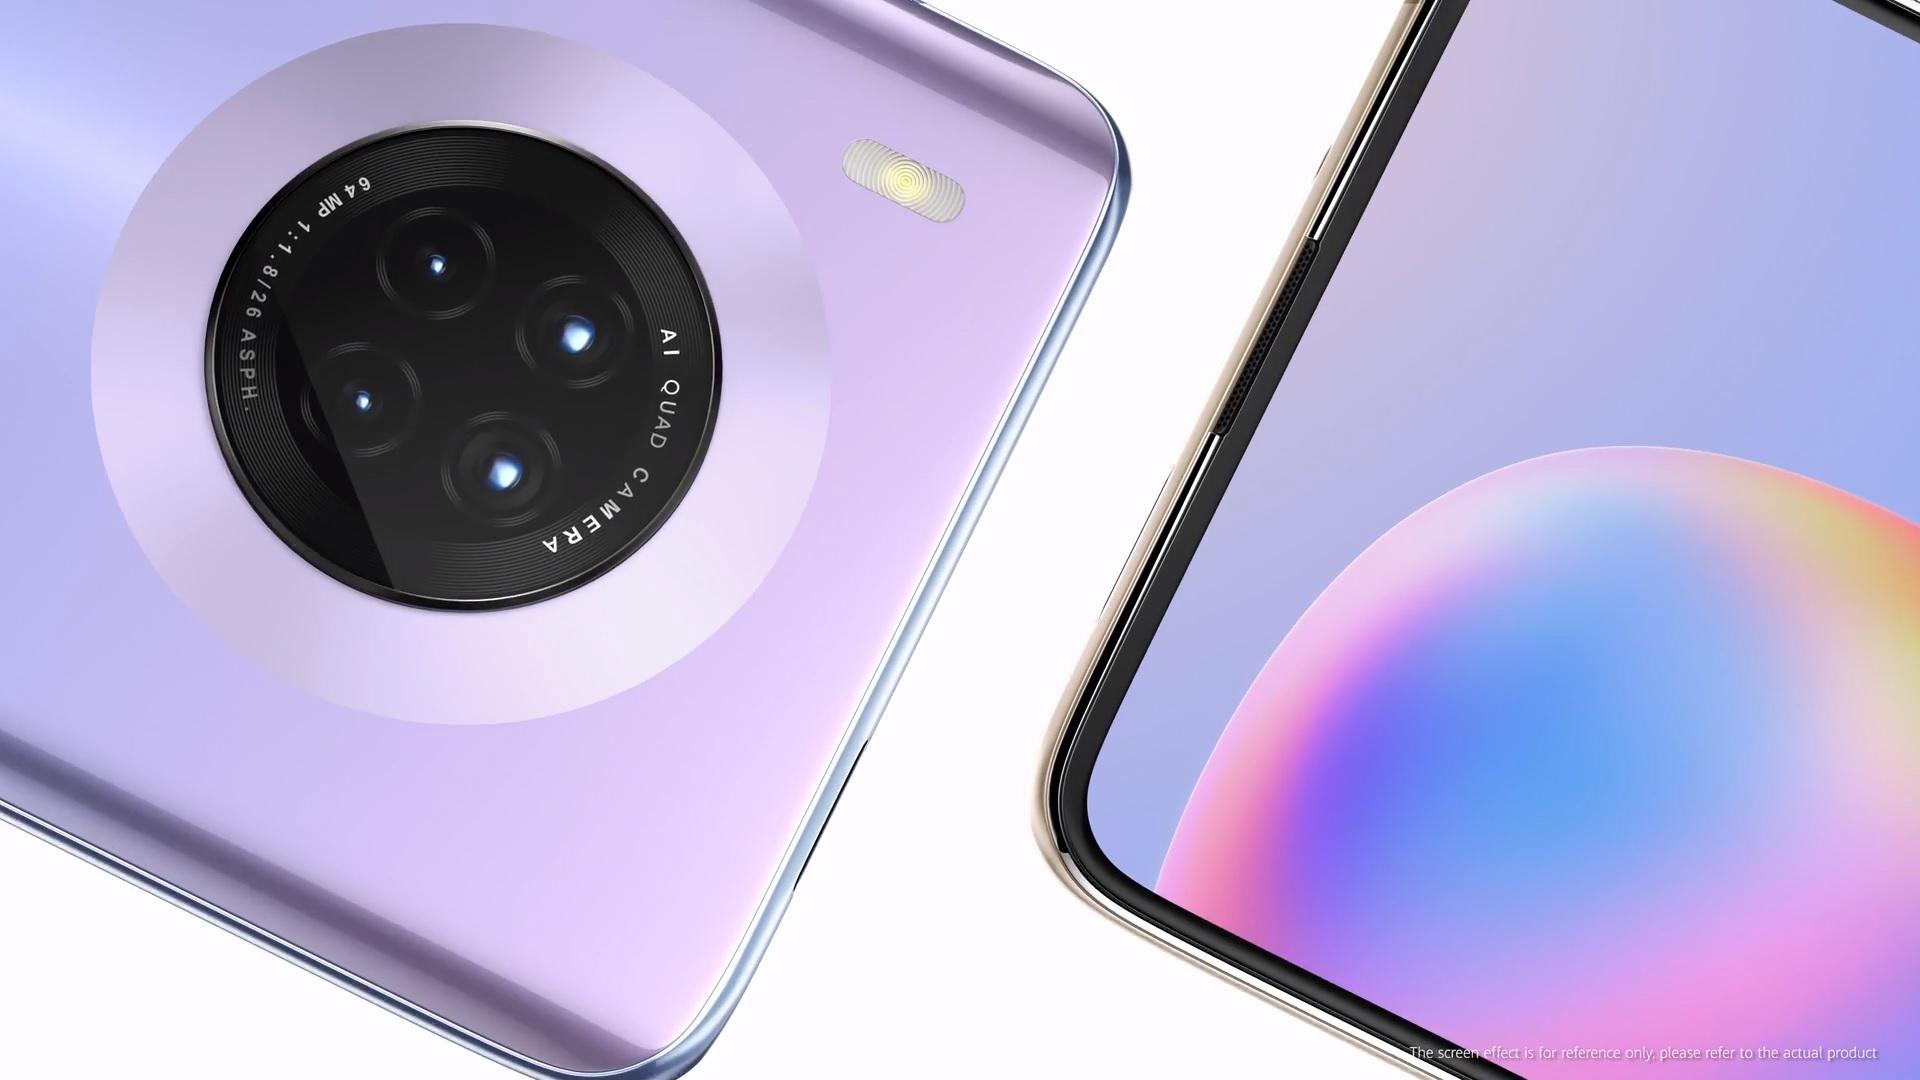 smartfon Huawei Y9a smartphone